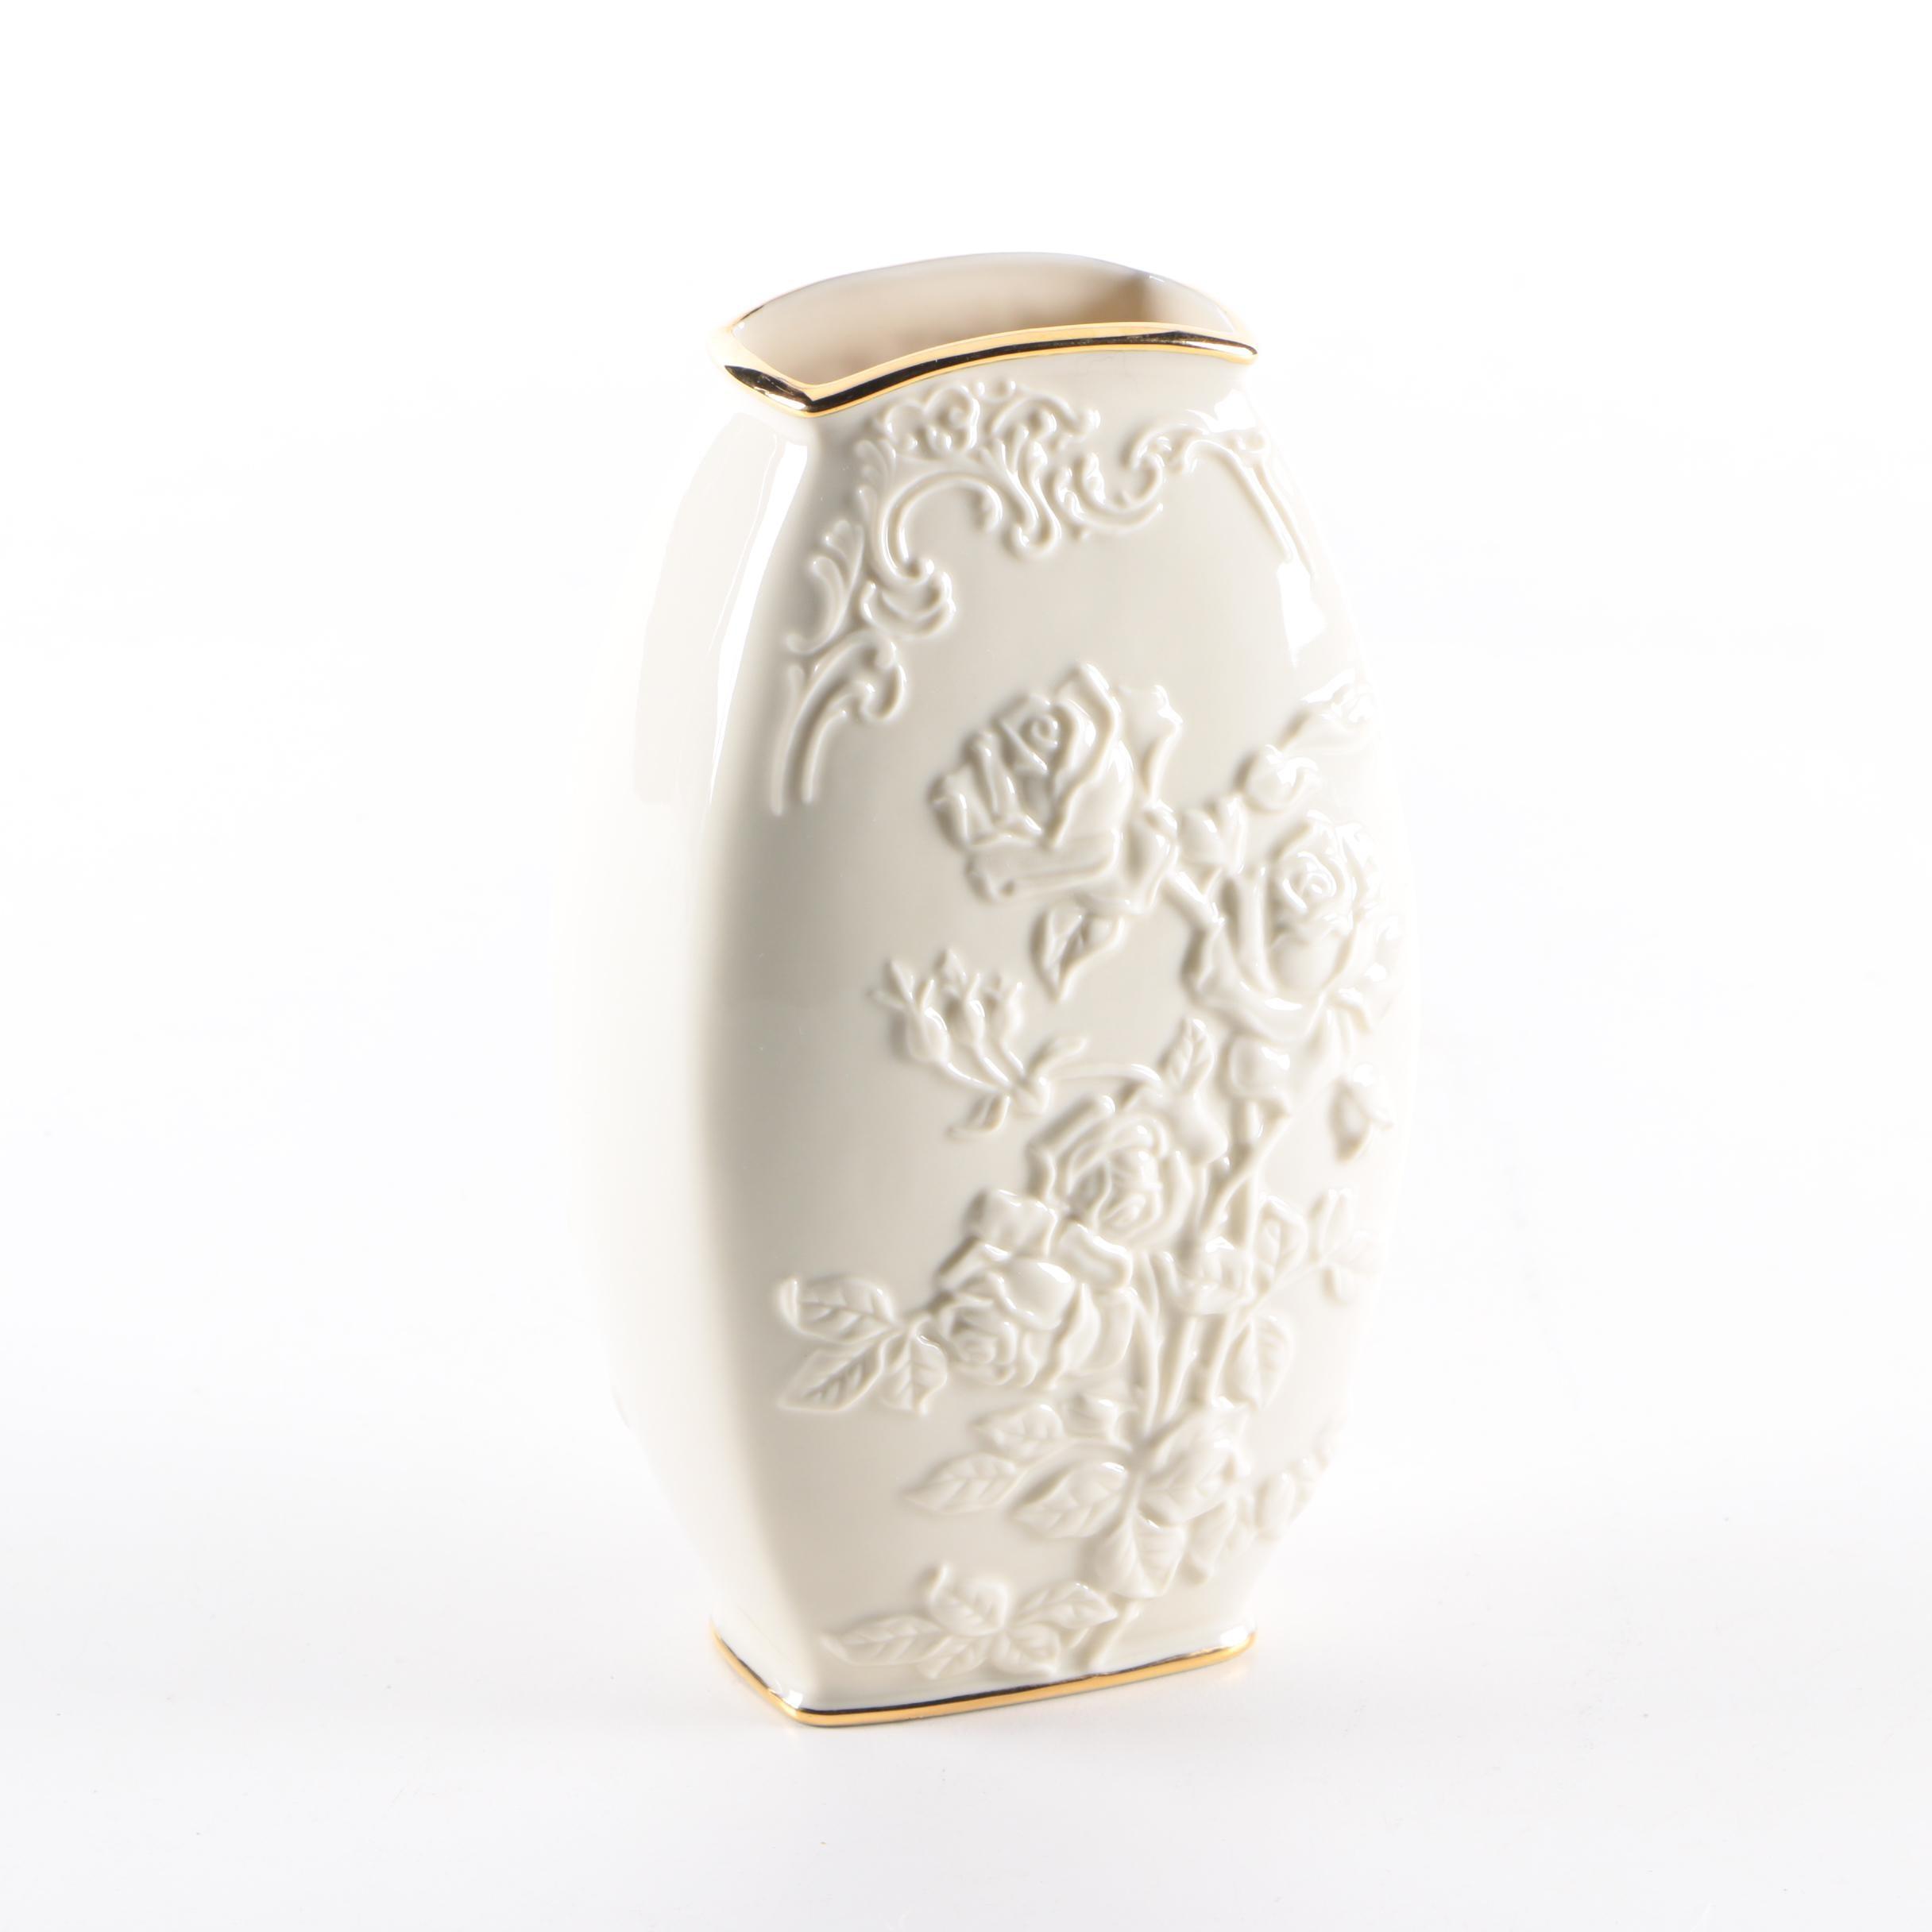 Lenox Porcelain Embossed Rose Vase